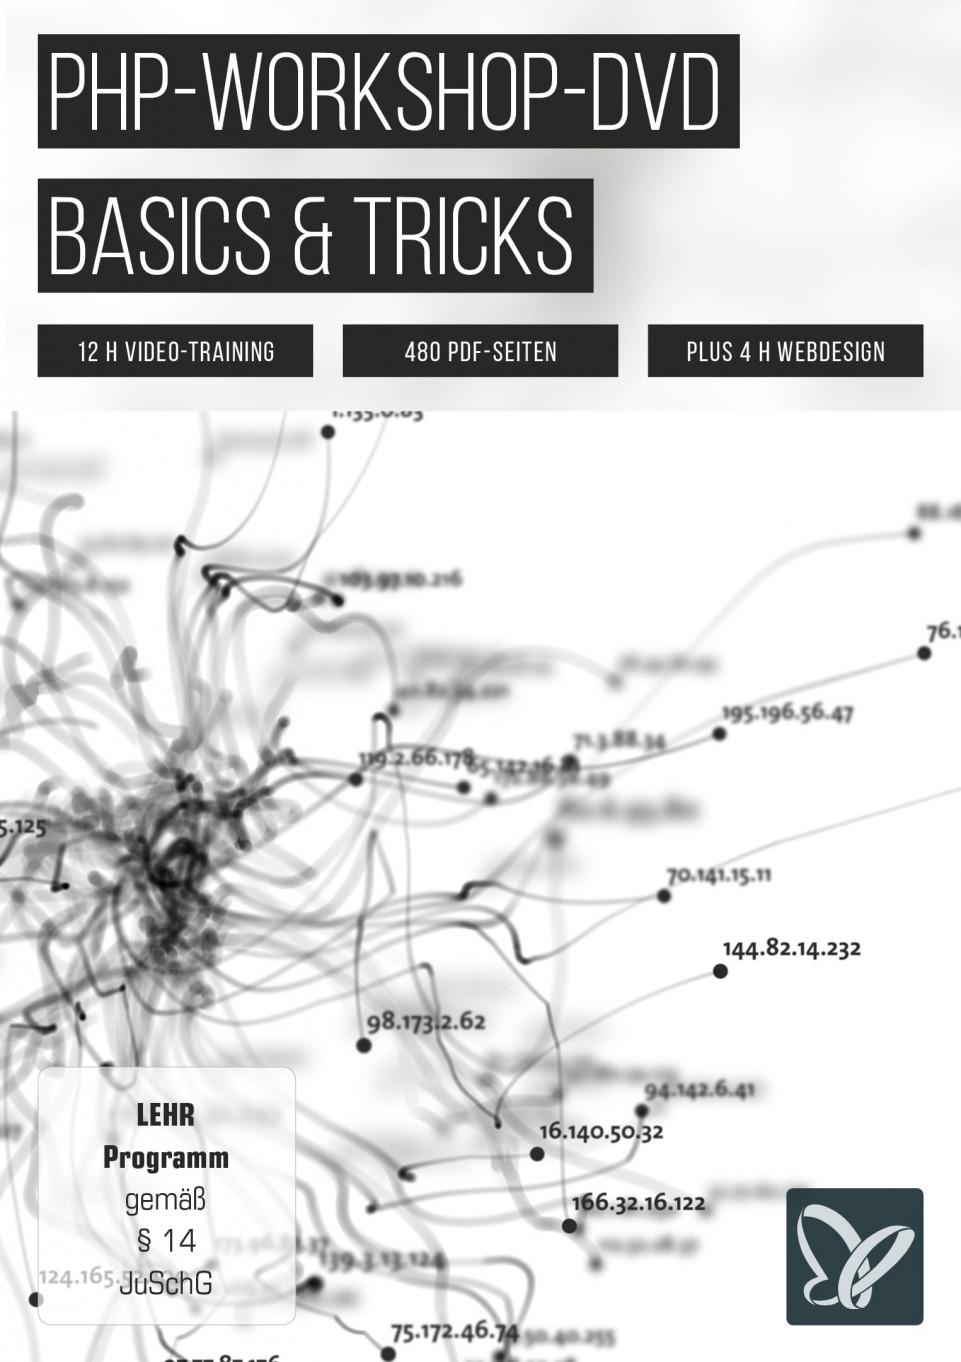 PHP-Workshop-DVD - Basics & Tricks